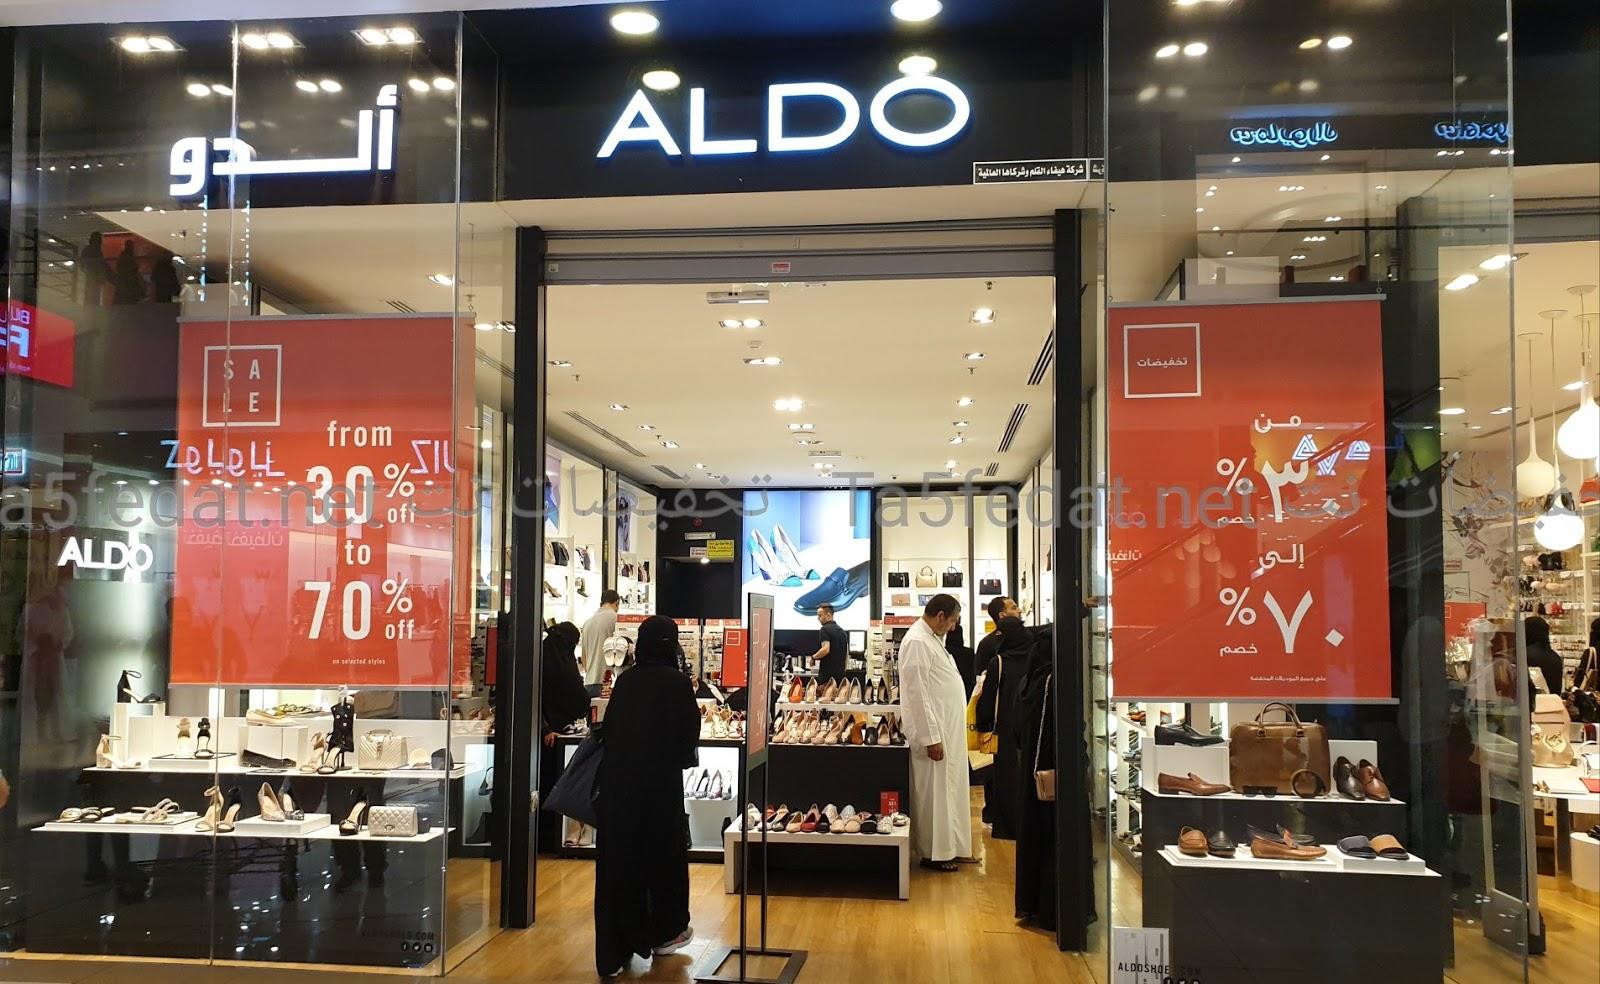 59b306bc8fe01 تخفيضات ألدو Aldo للحقائب والأحذية والاكسسوارات